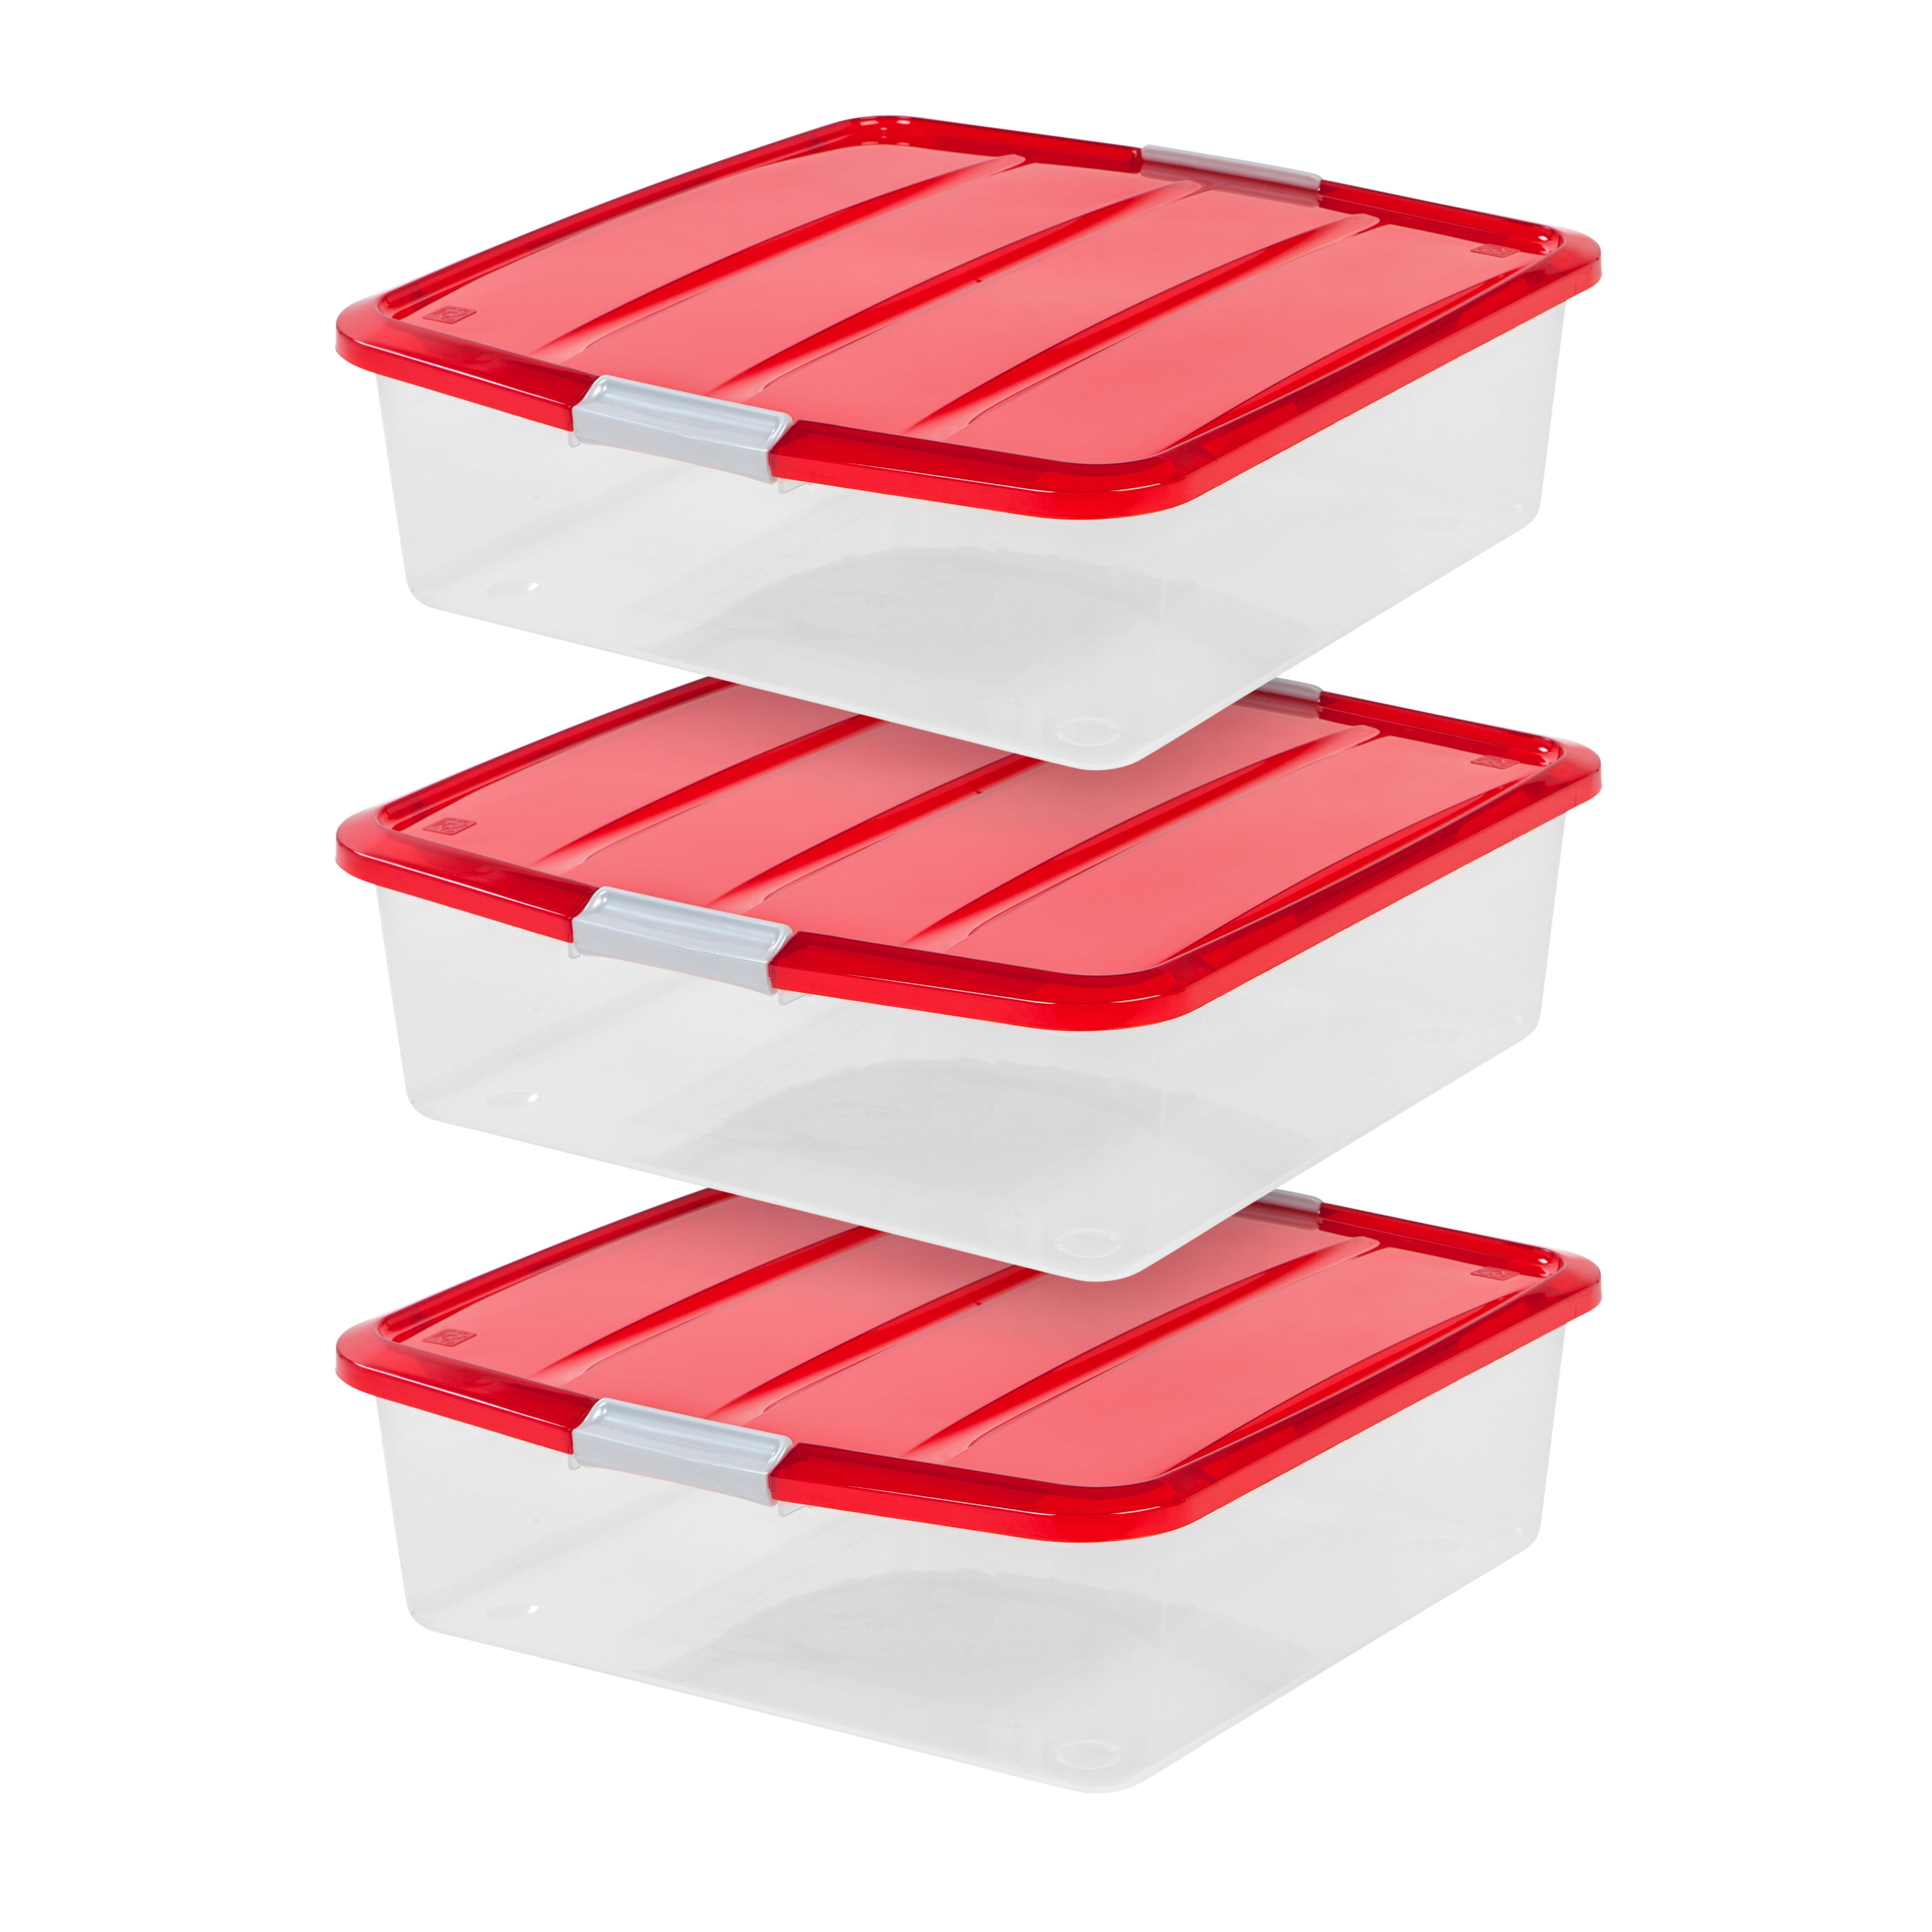 IRIS 20 Inch Wreath Storage Box, 3 Pack, Red